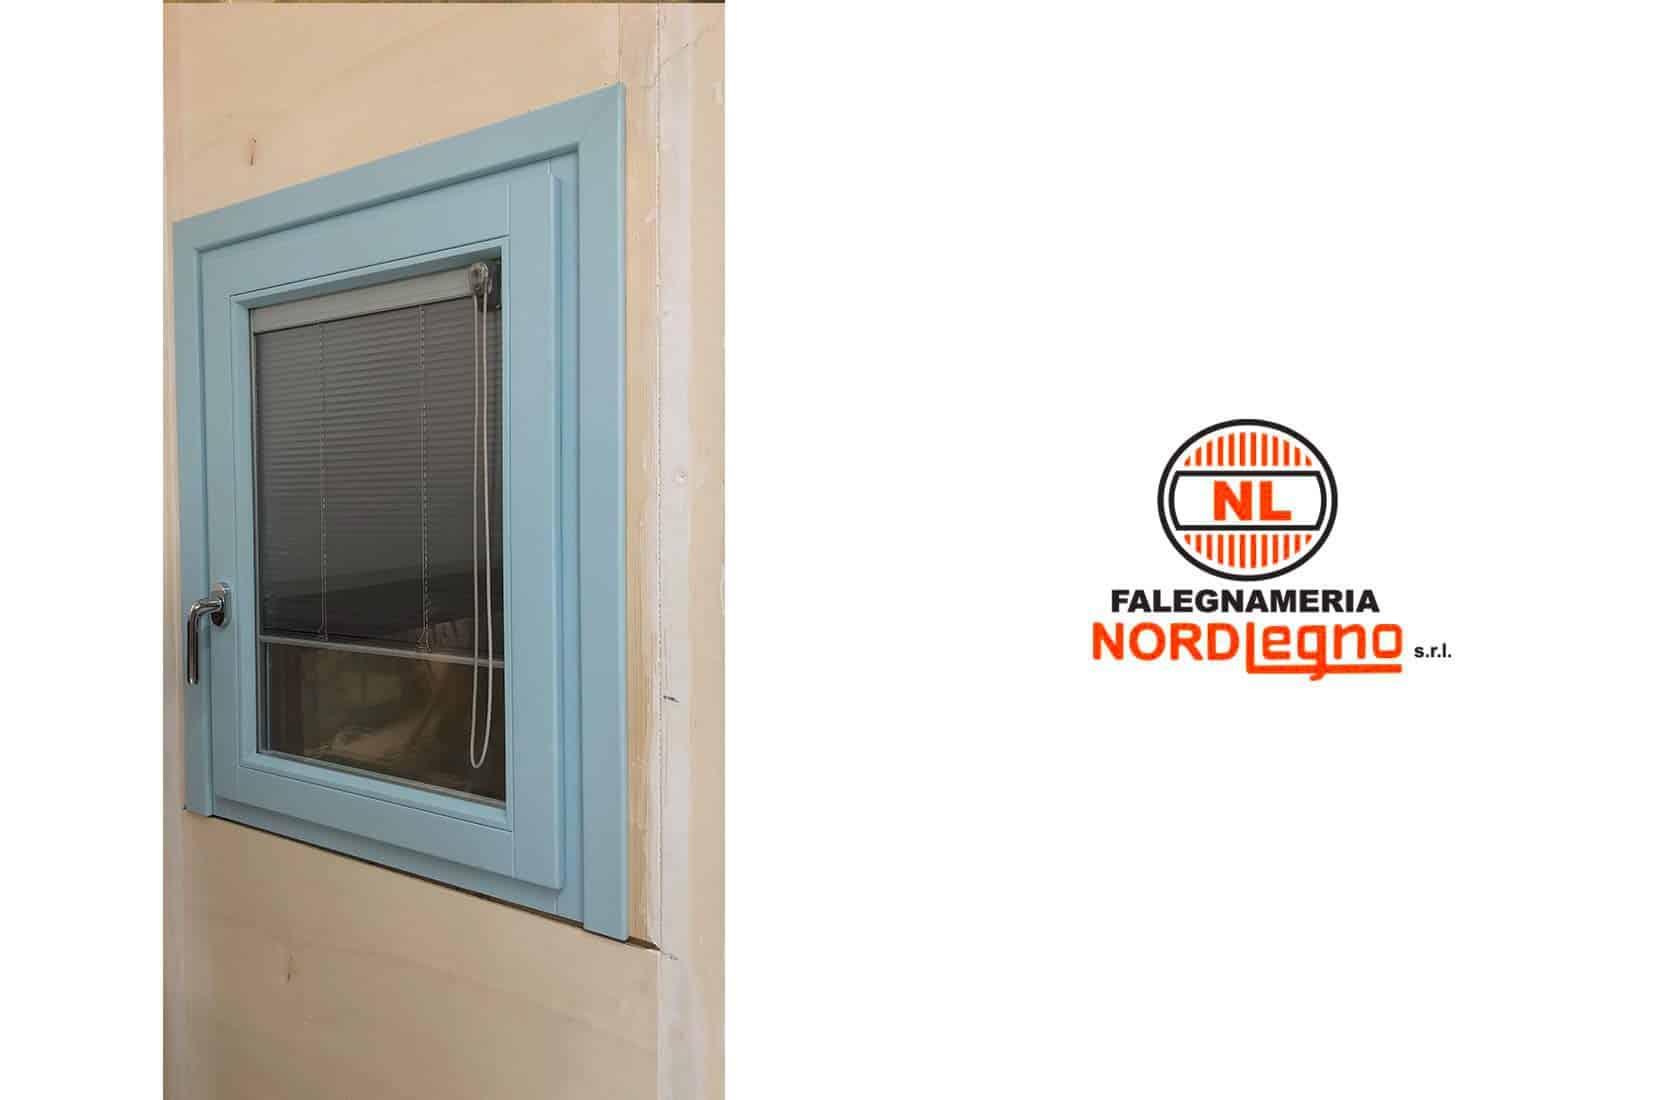 Falegnameria-calangianus-nord-legno-infissi-esterni-legno-alluminio.jpg